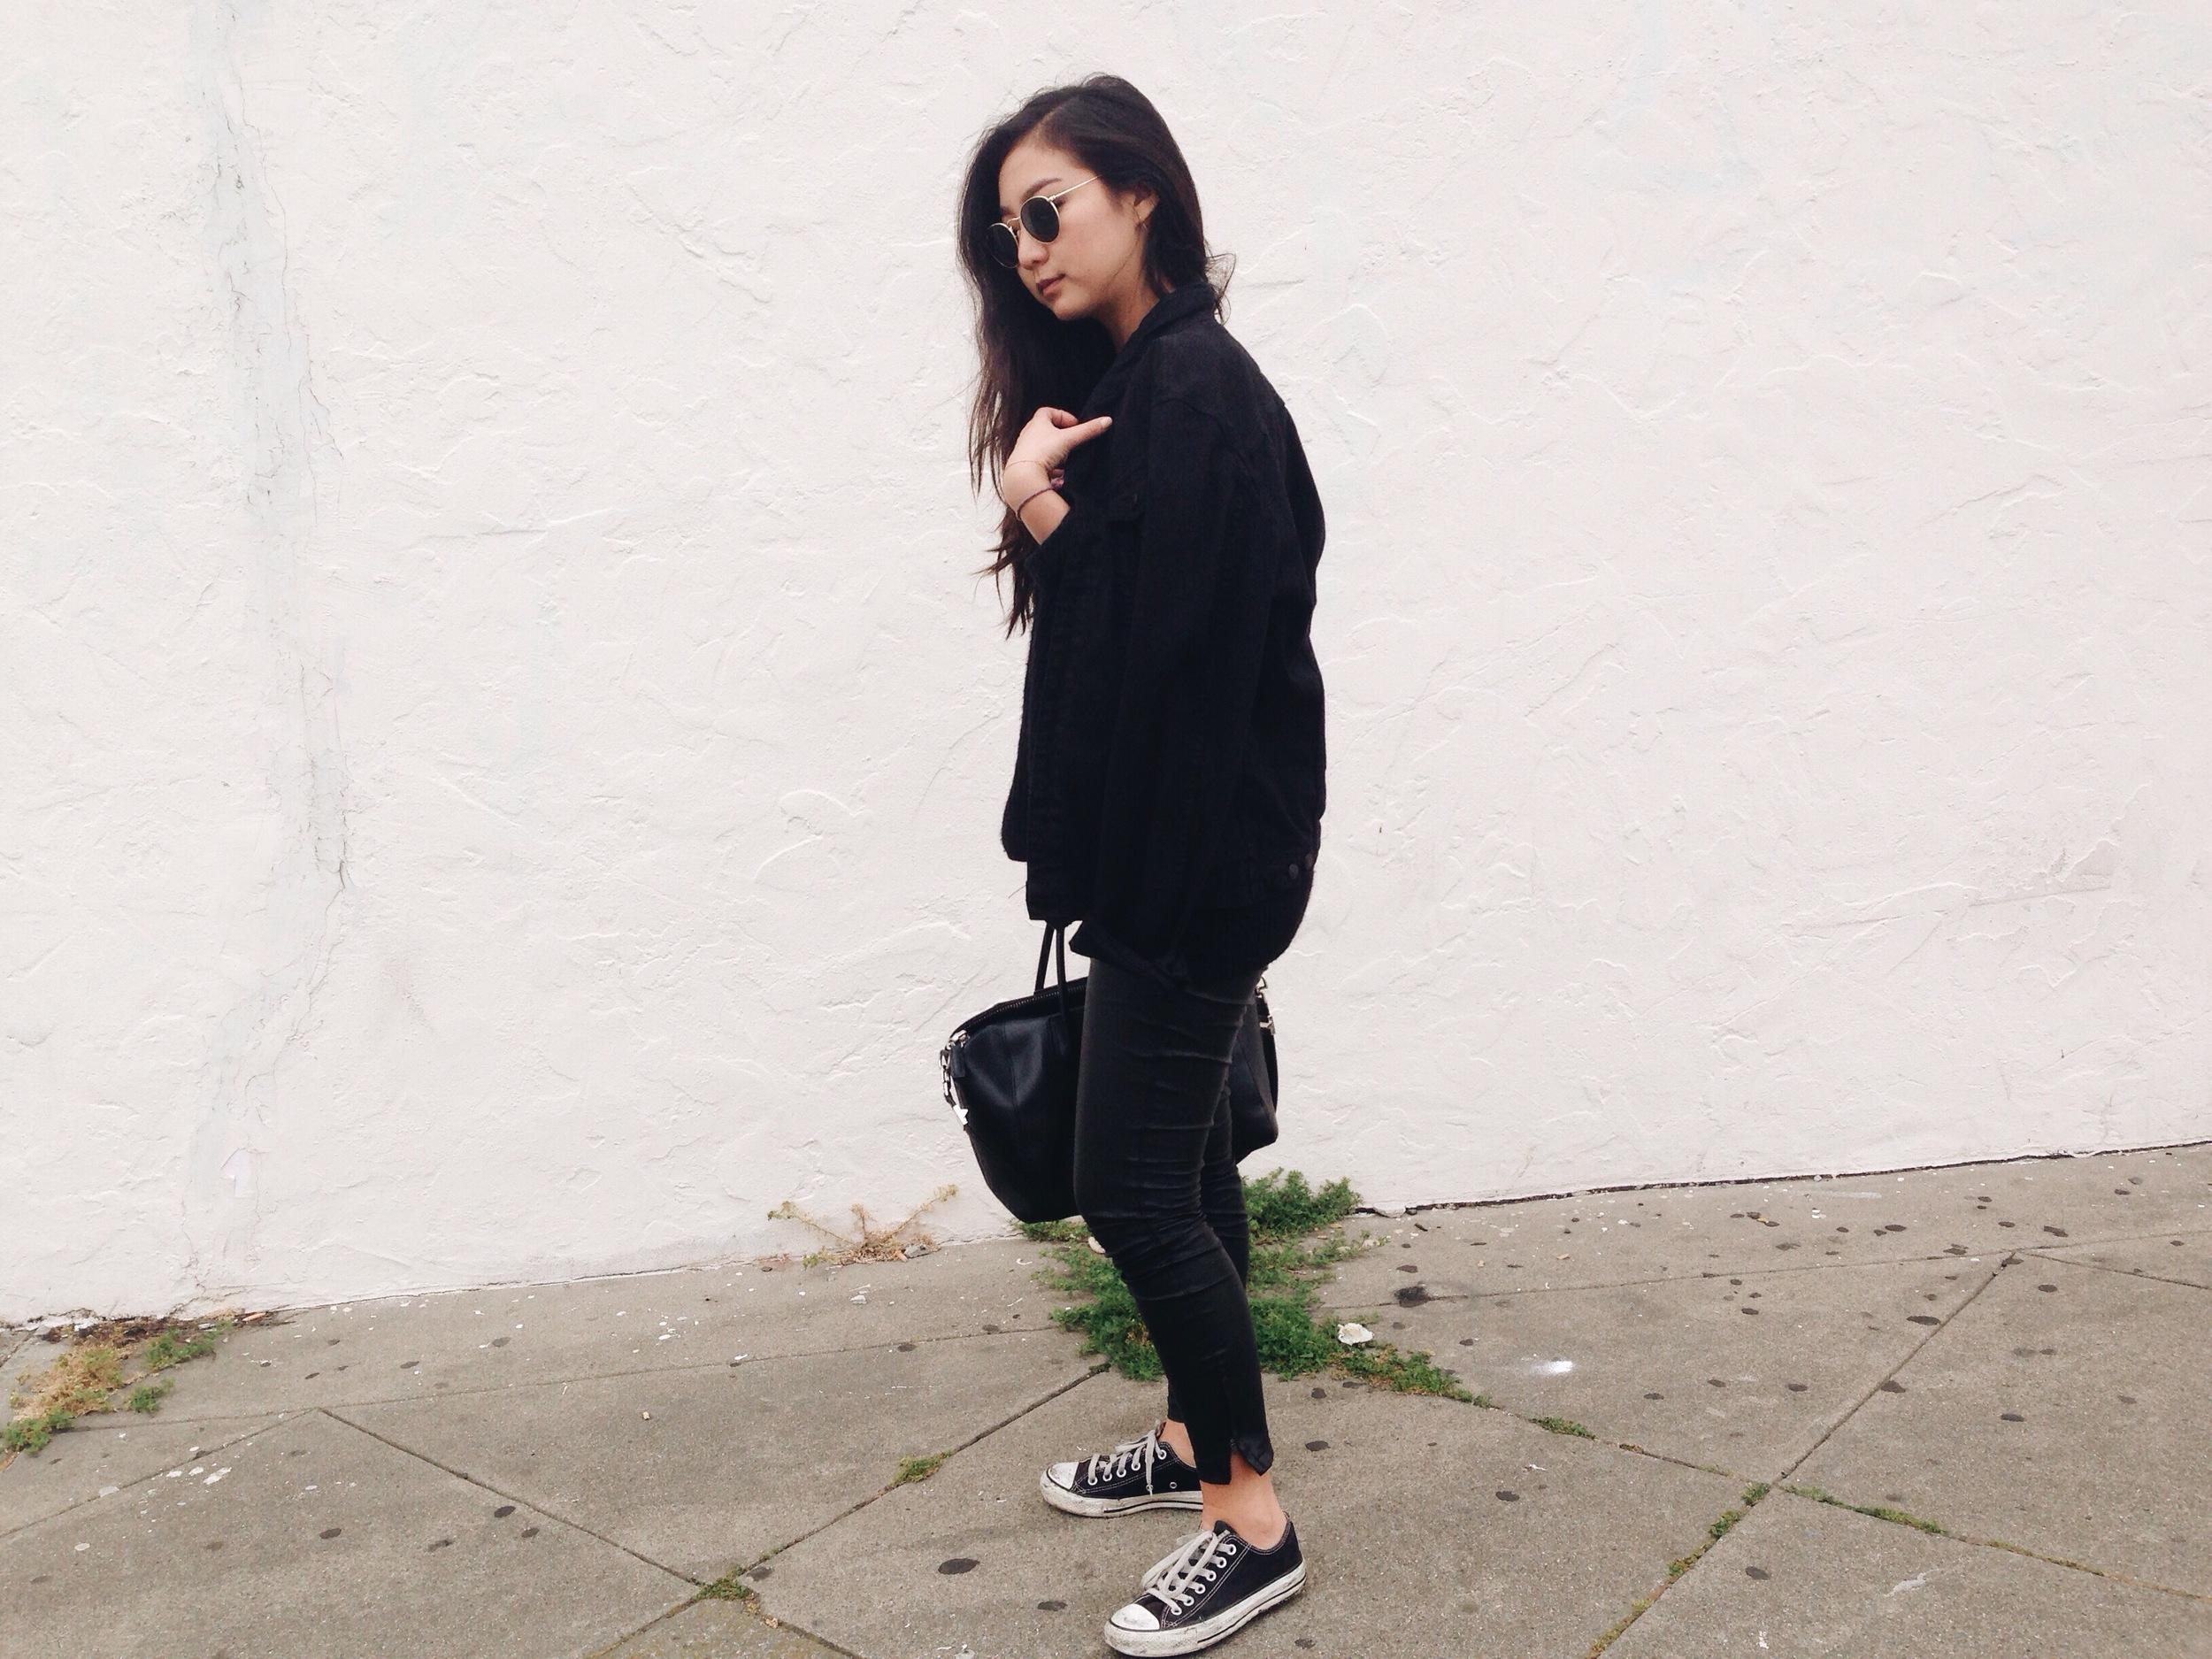 ZARA  black denim jacket (from men's section) /  BLANK DENIM   vegan leather leggings  /  CONVERSE   sneakers  / REFORMATION  Jetty dress